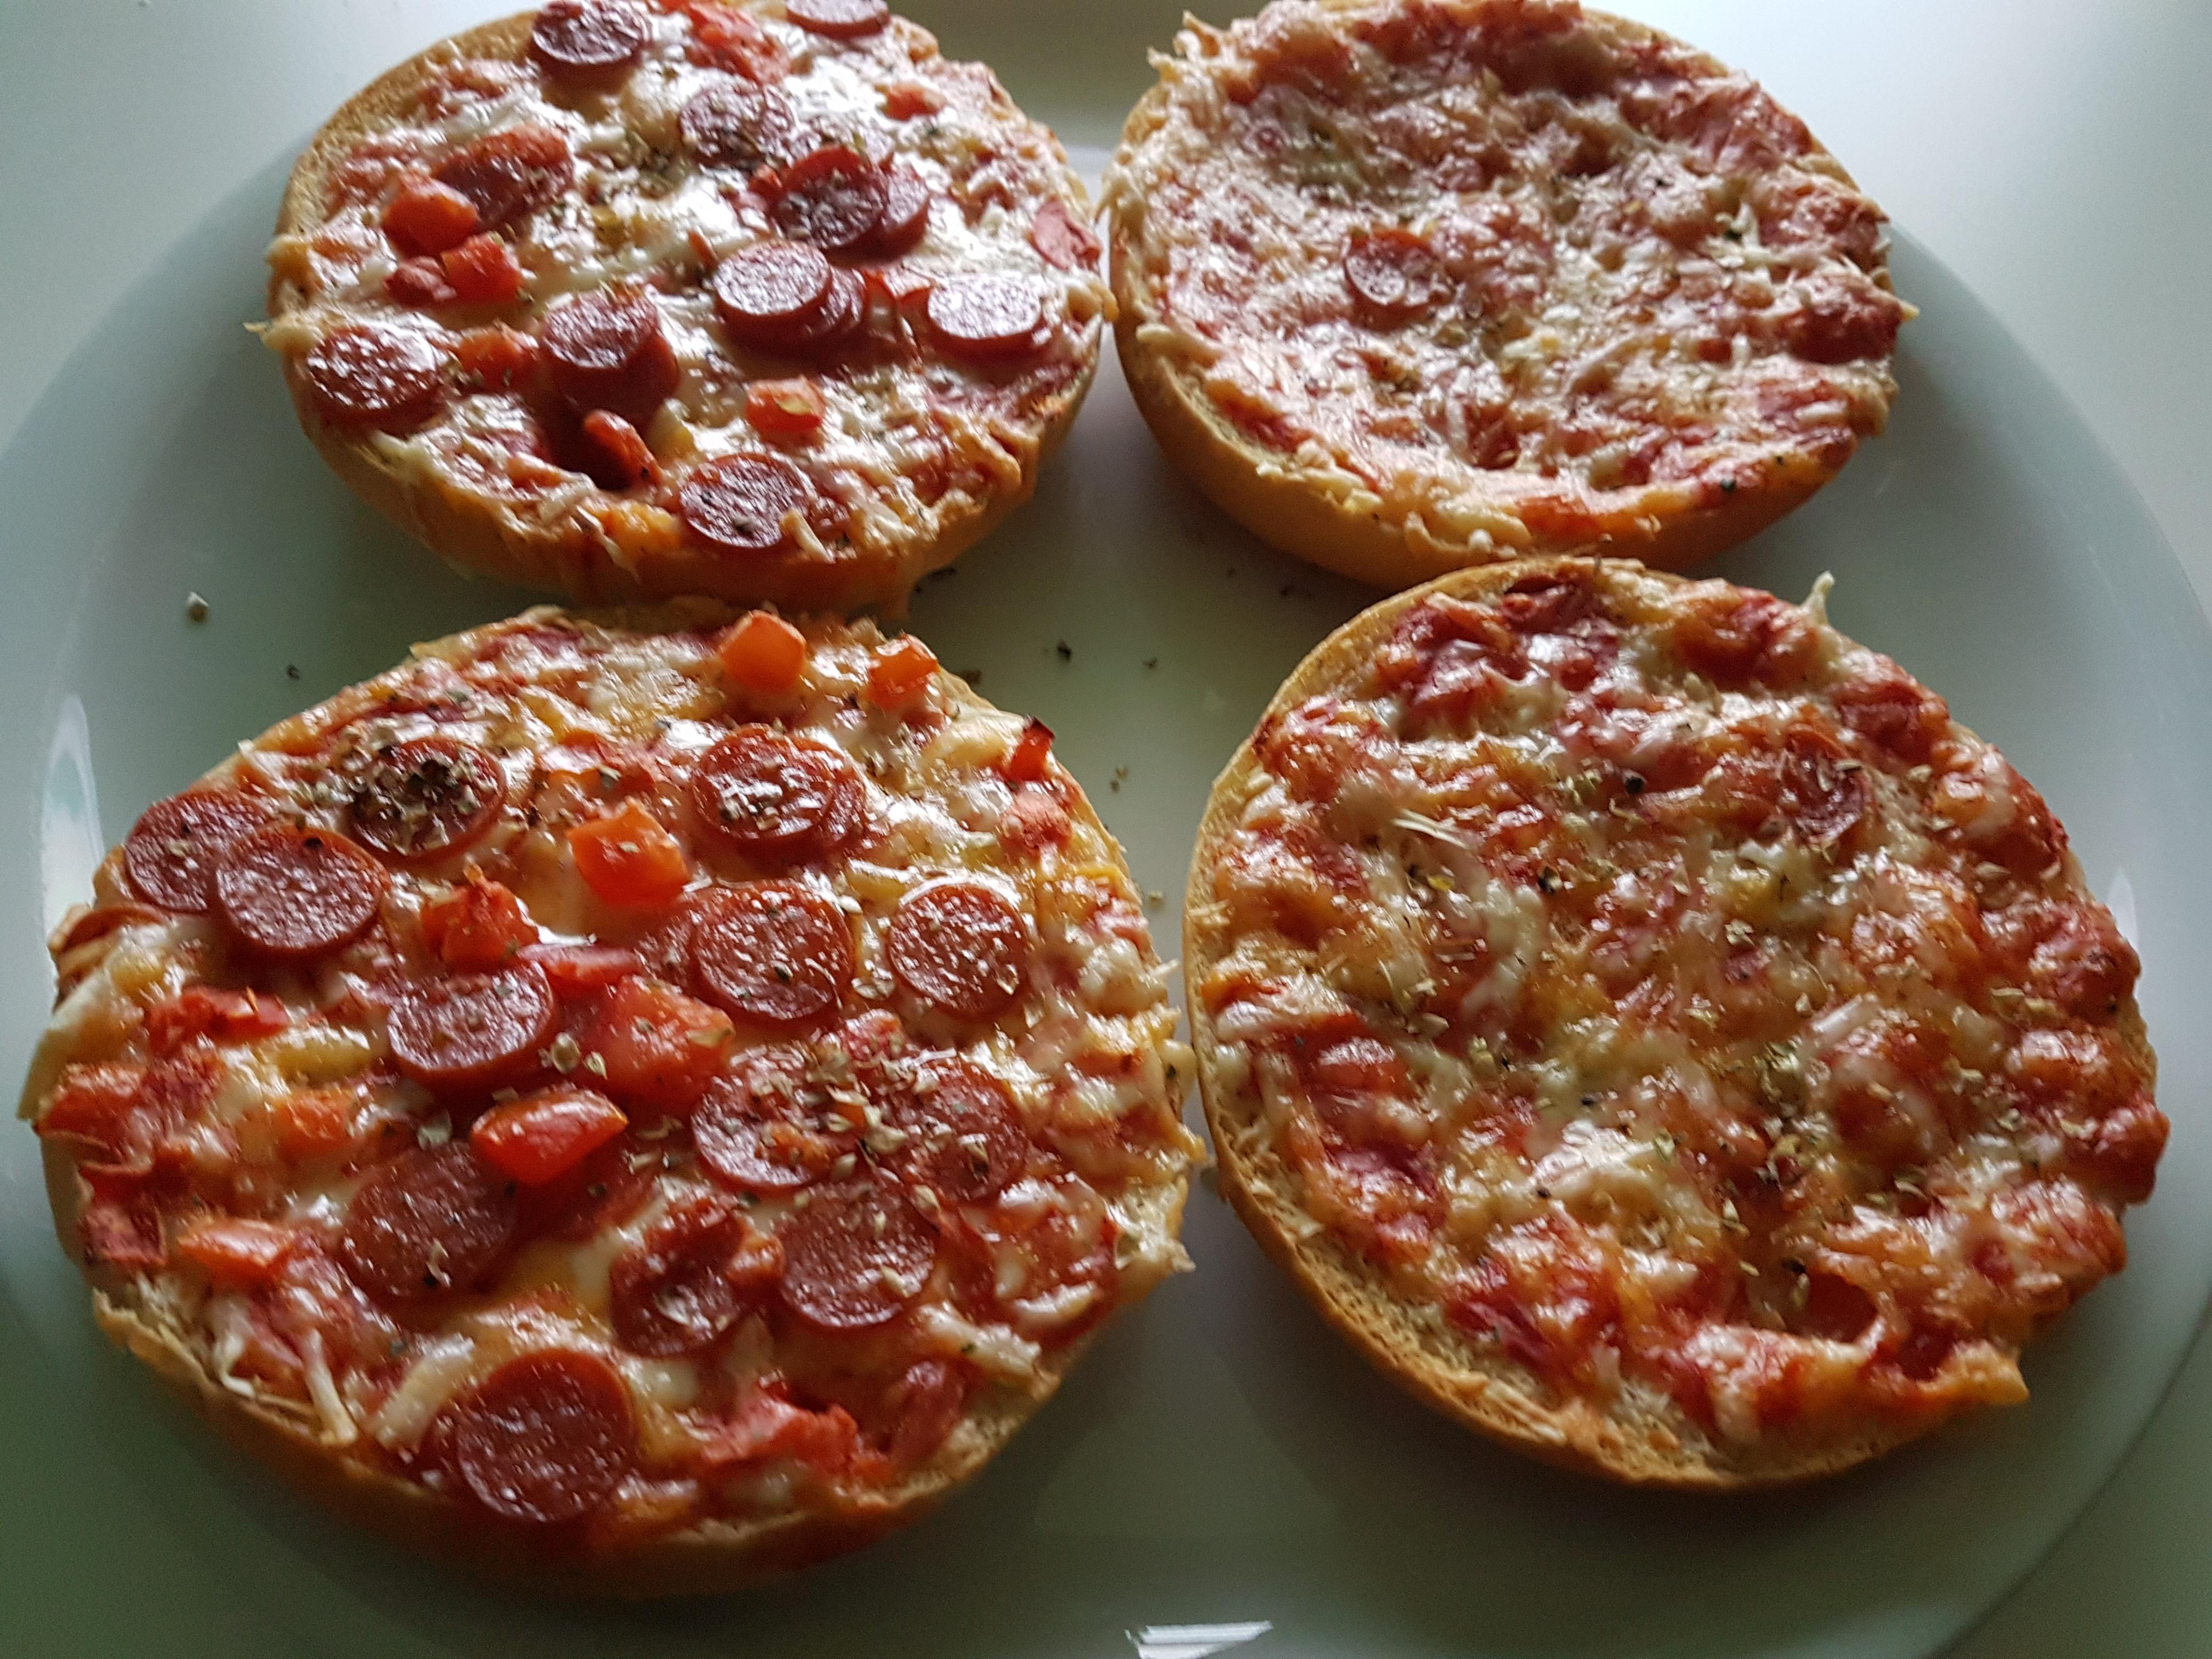 https://foodloader.net/Holz_2018-02-22_Pizzaburger.jpg